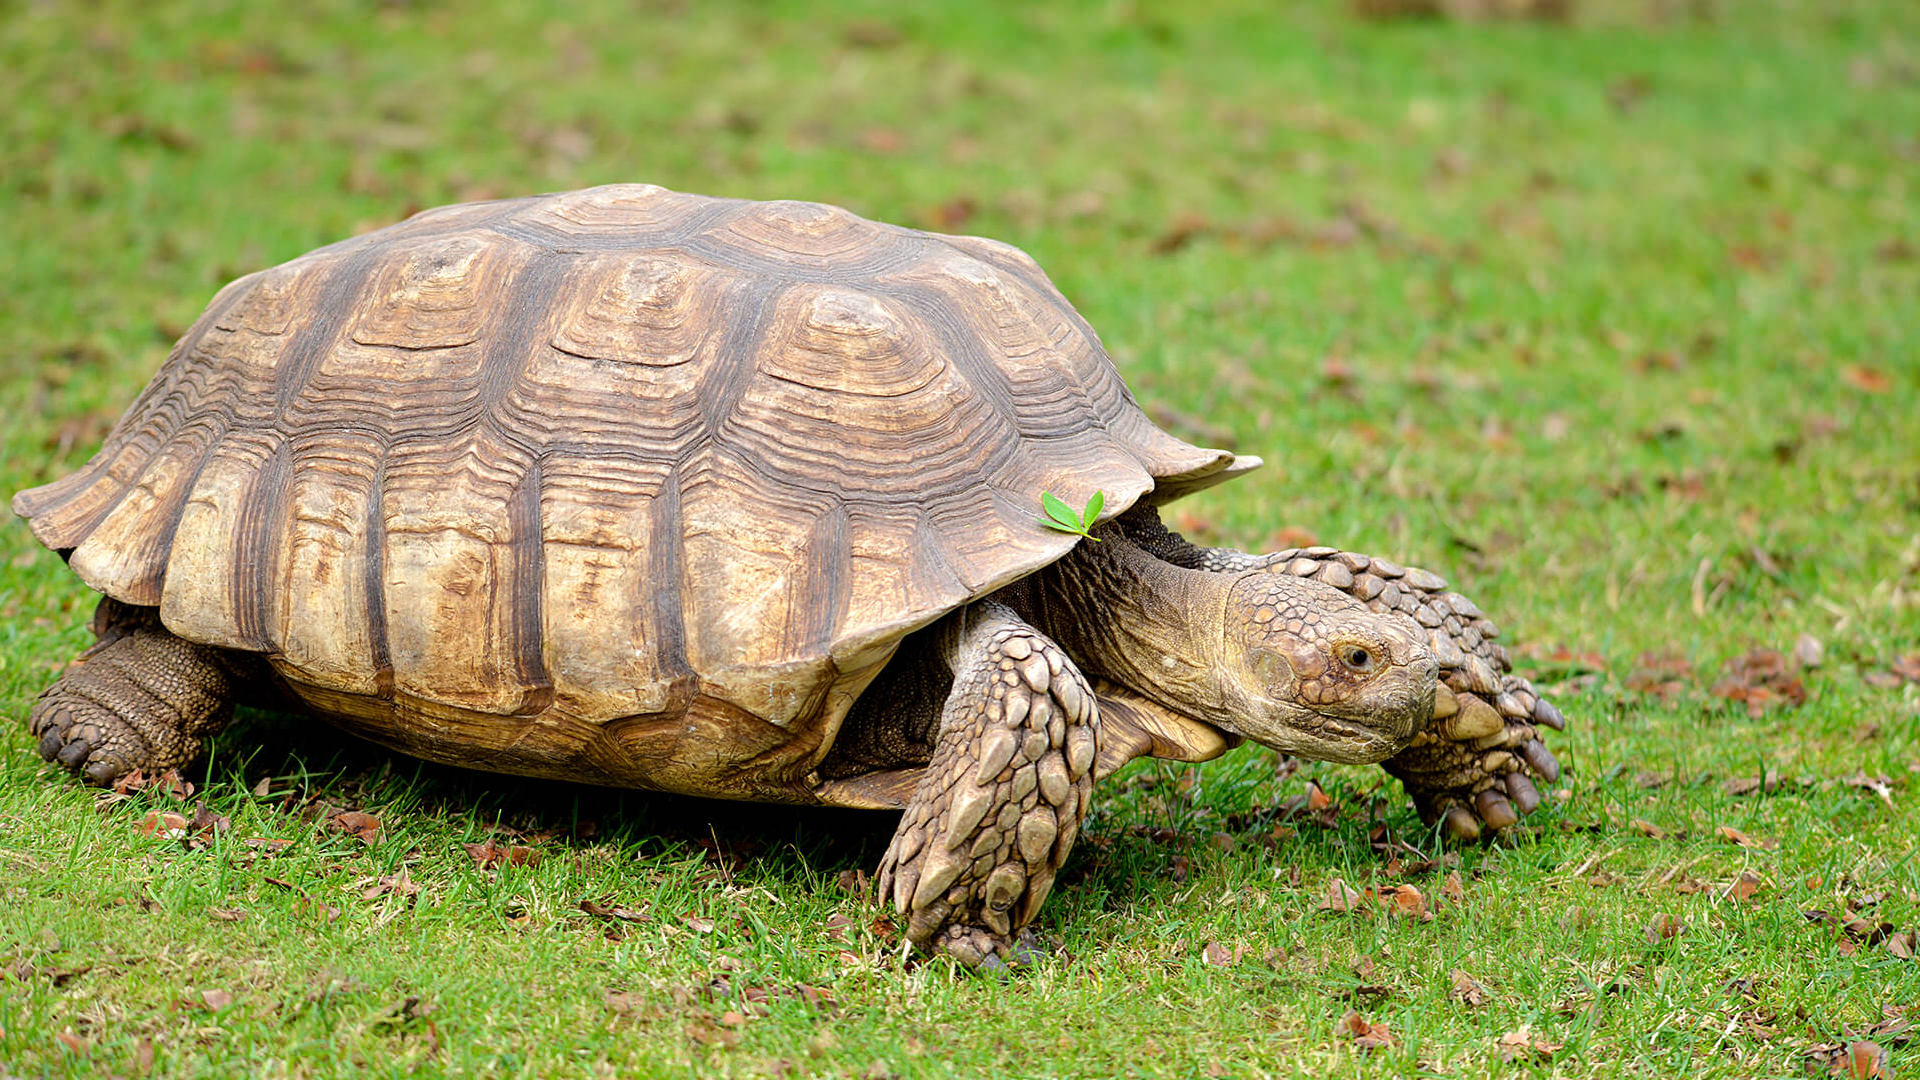 African Spurred Tortoise  San Diego Zoo Animals & Plants